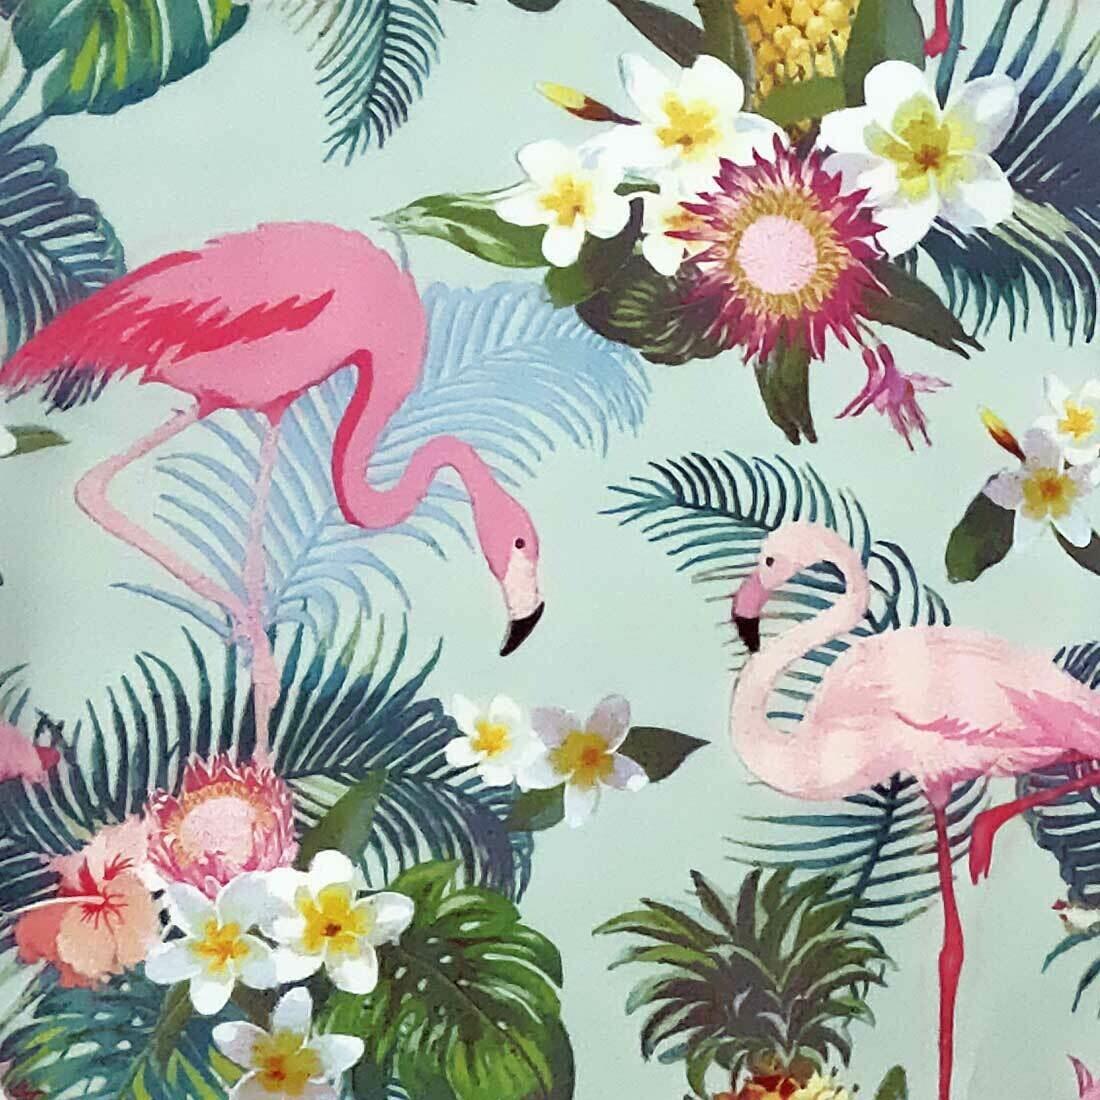 Decoupage Flamingo Paper Napkin 13x13 - (1 Sheet)